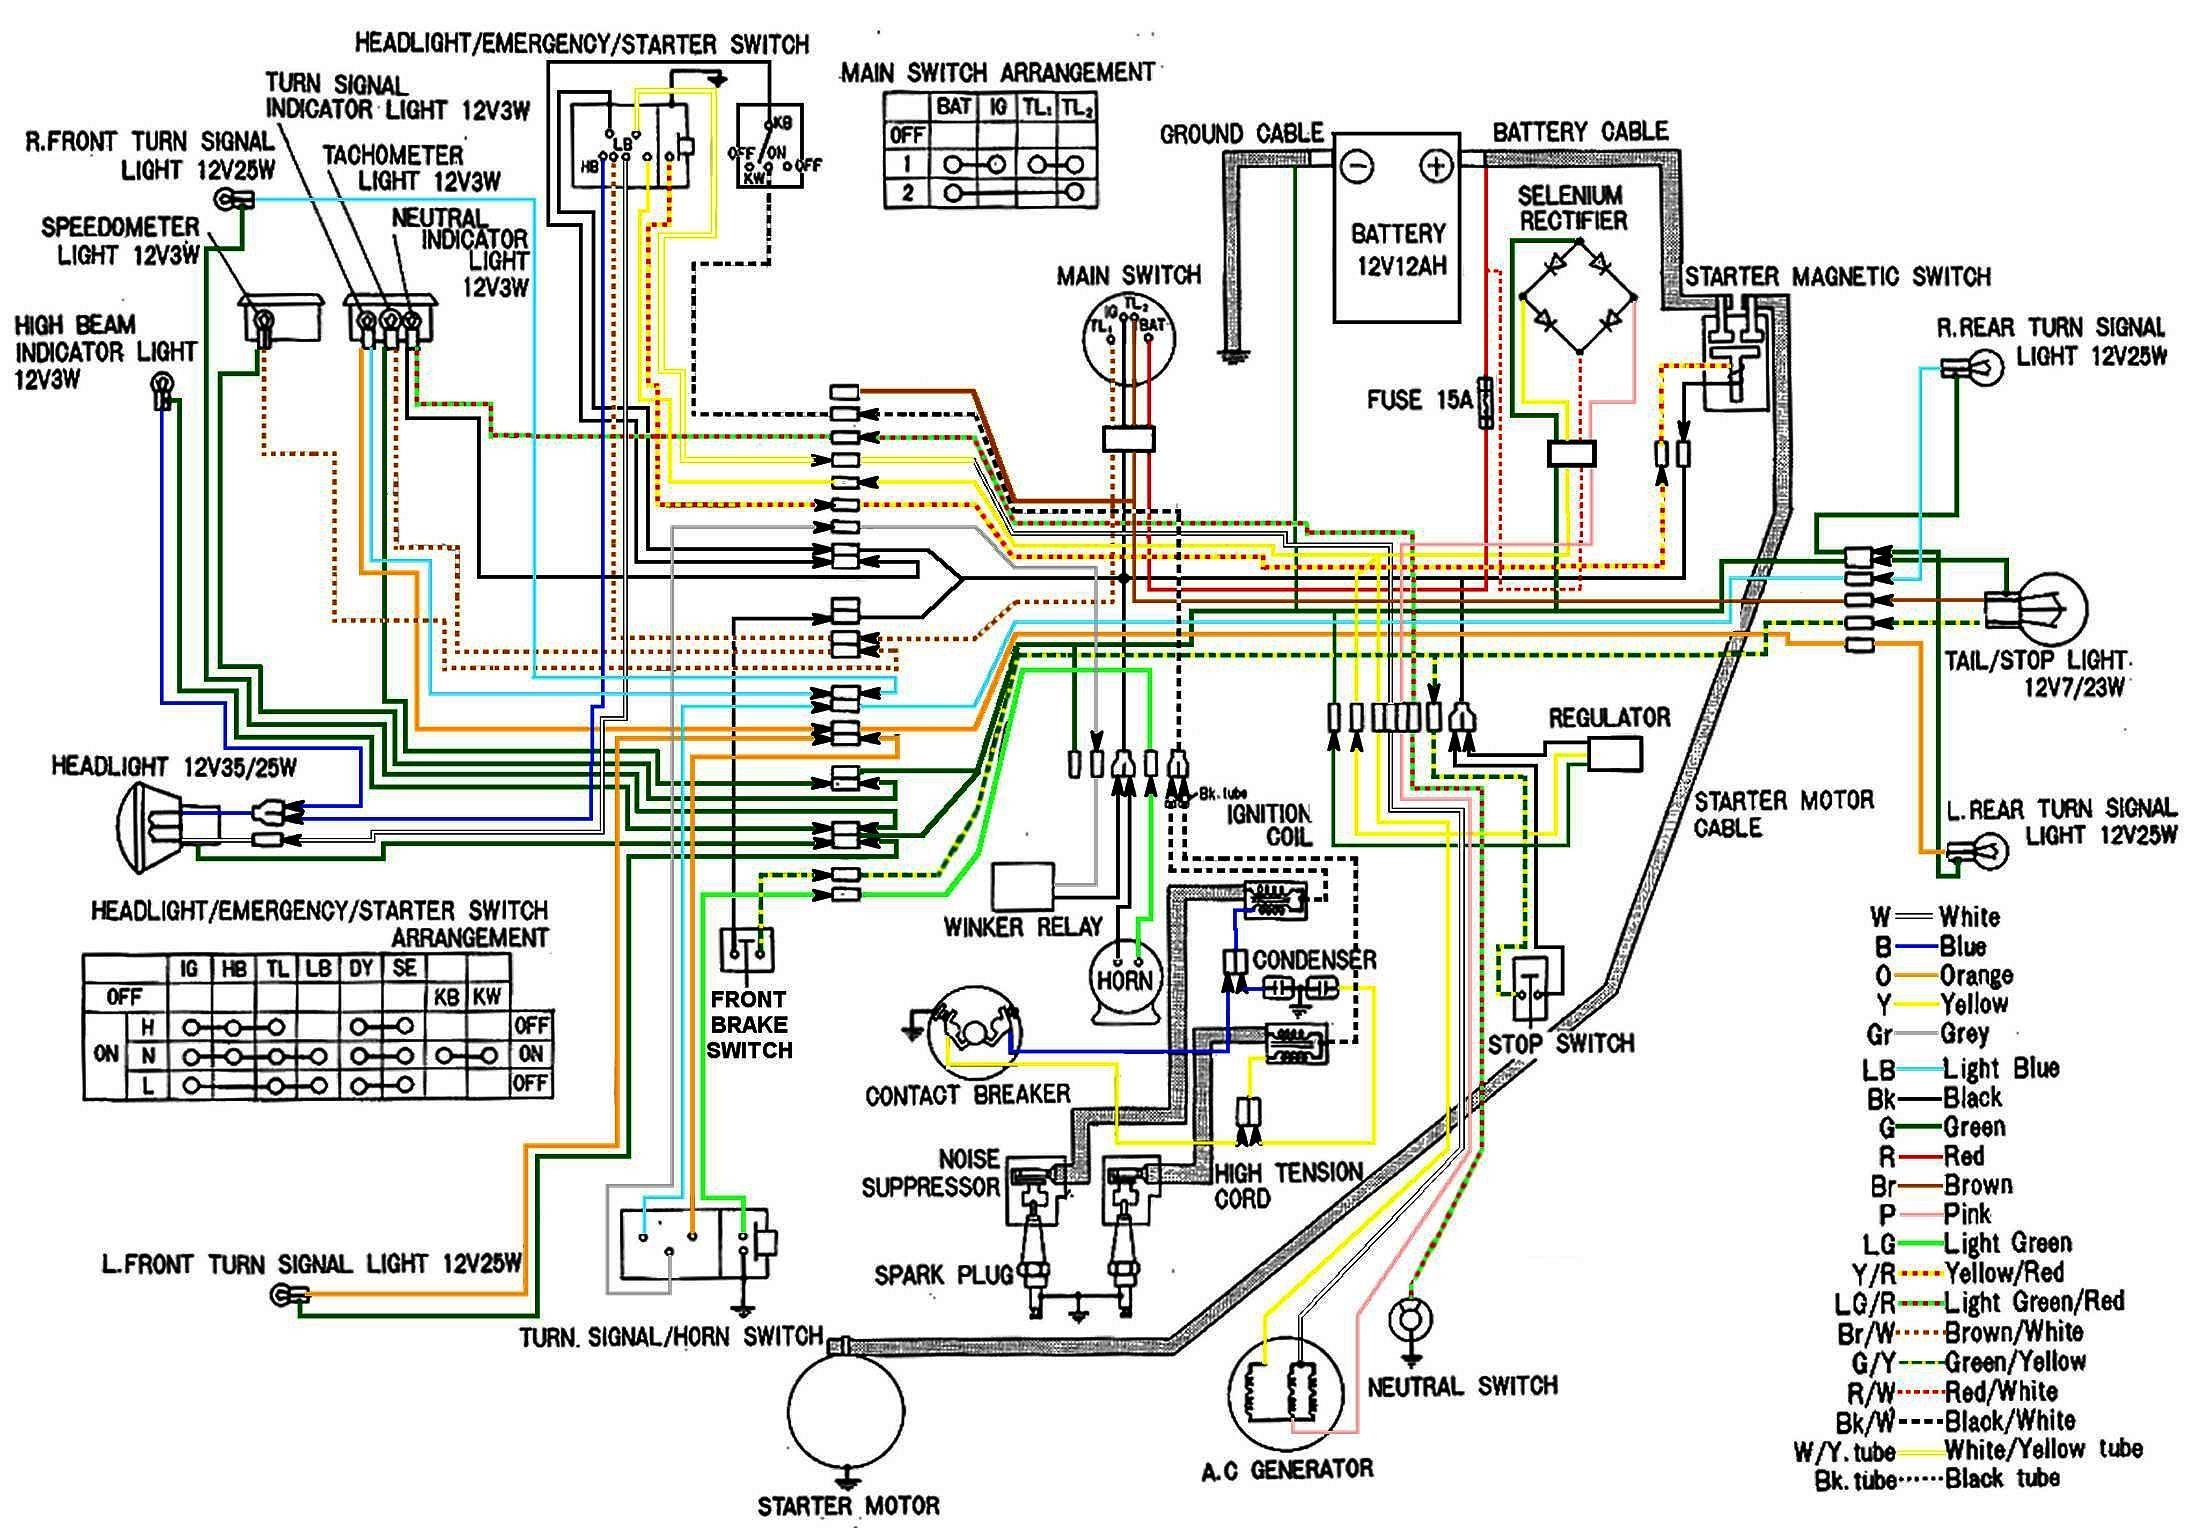 cb450 color wiring diagram (now corrected) | honda twins  honda twins